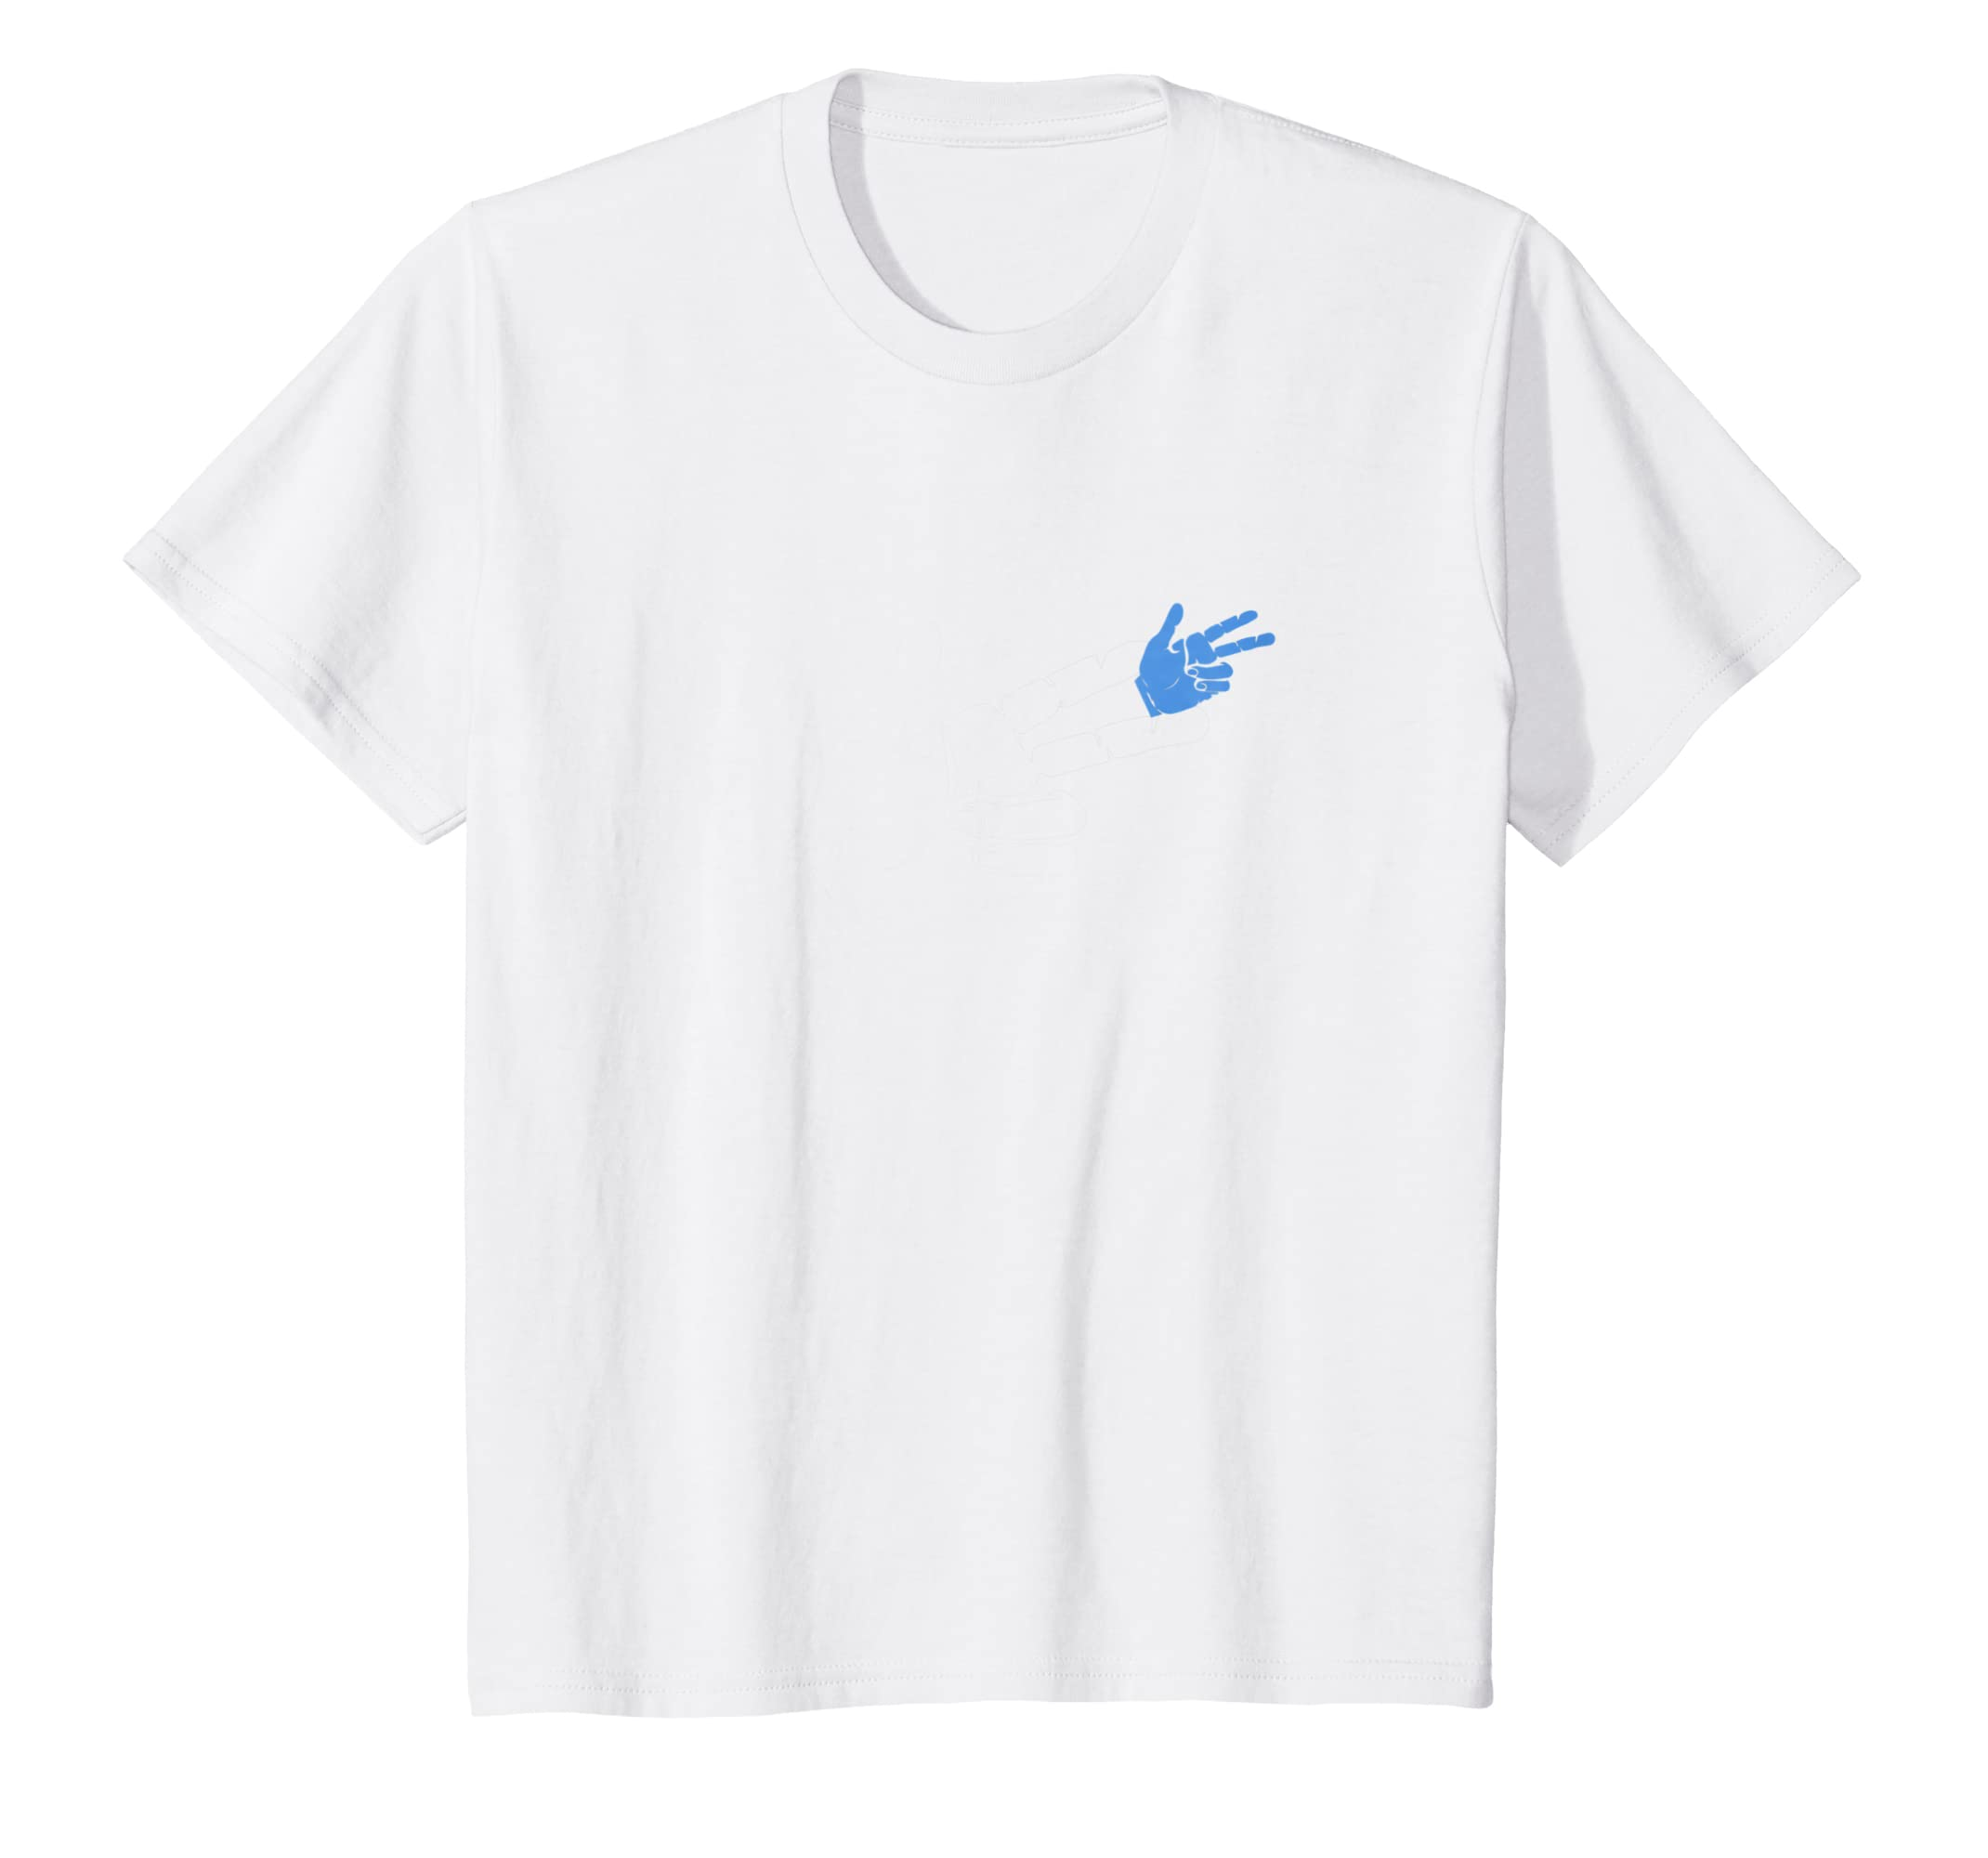 GangGang Member of the gangsta OG T Shirt   Blue Logo Design